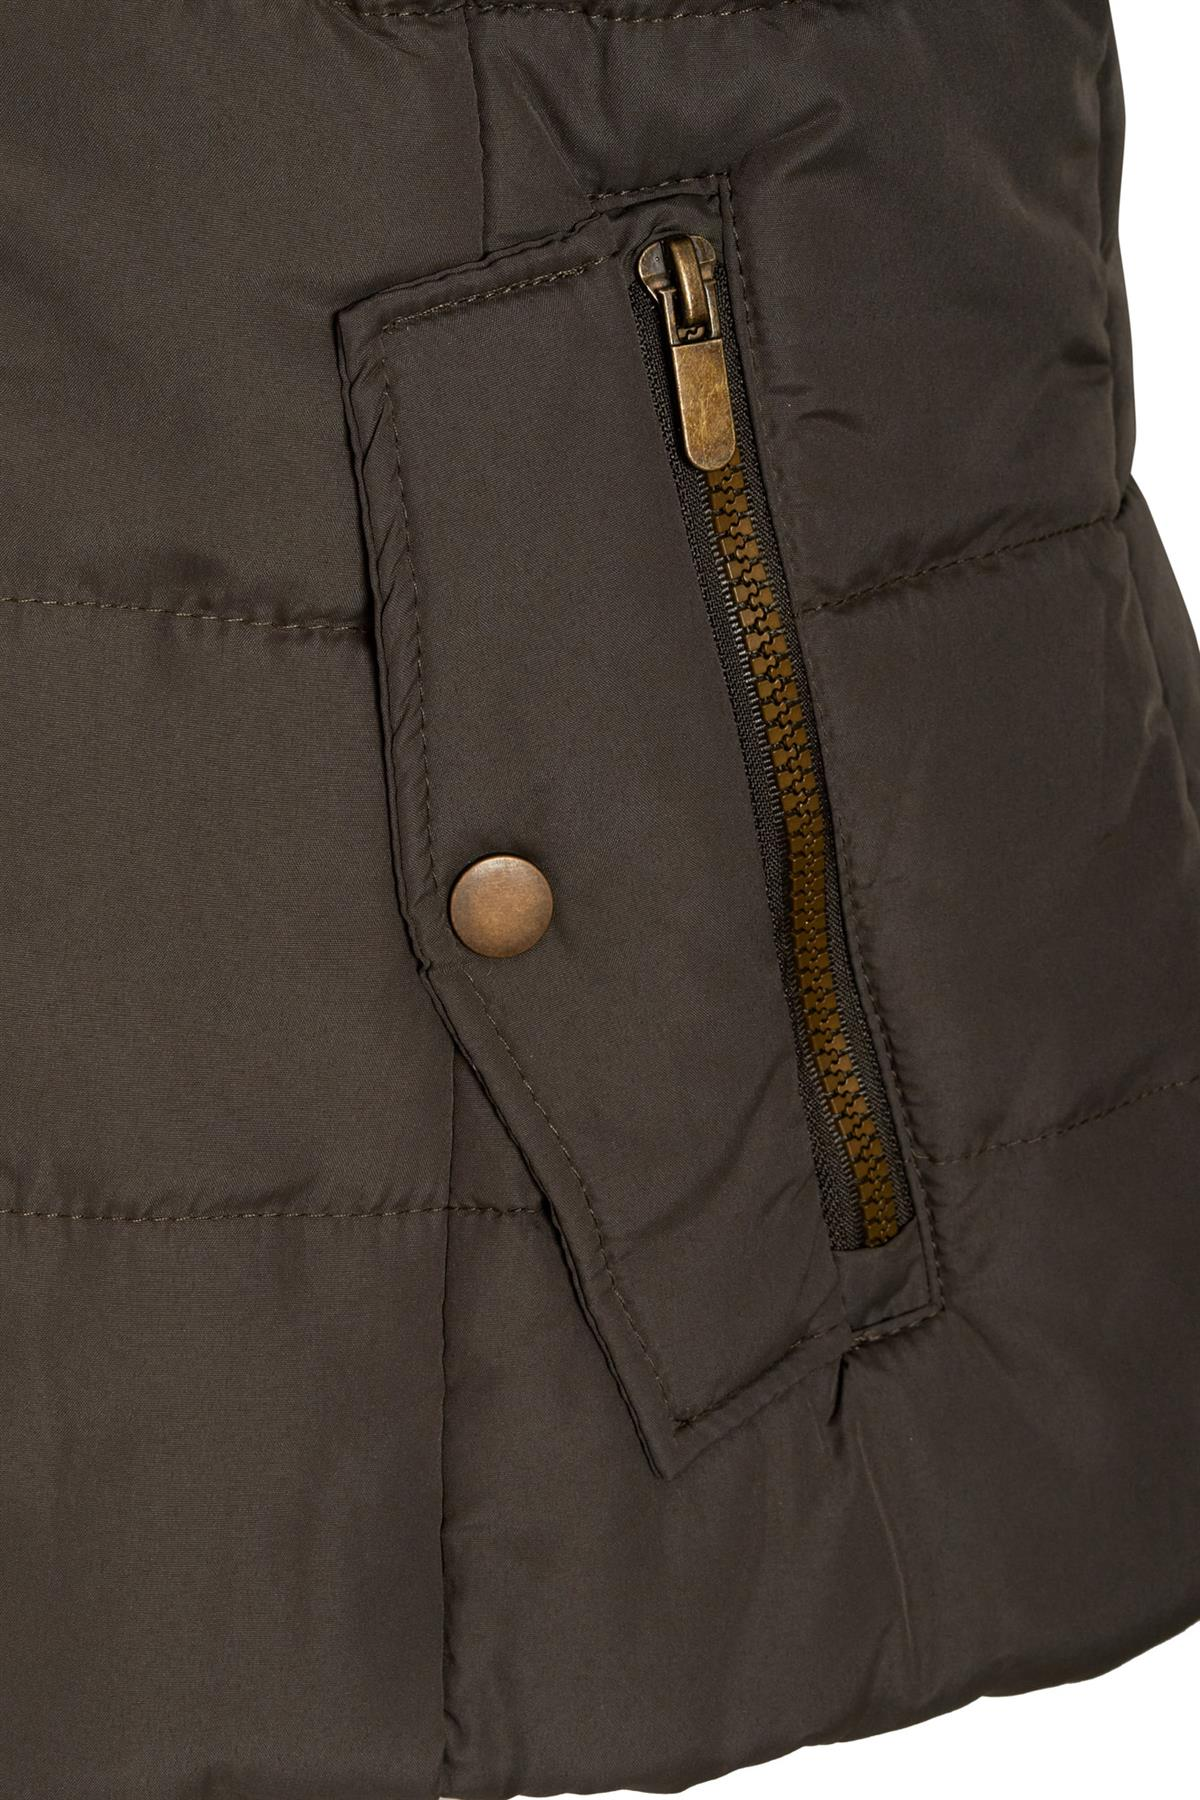 Shelikes-Ladies-Padded-Faux-Fur-Trim-Hood-Hooded-Jacket-Winter-Coat-Size-6-to-16 miniatuur 9